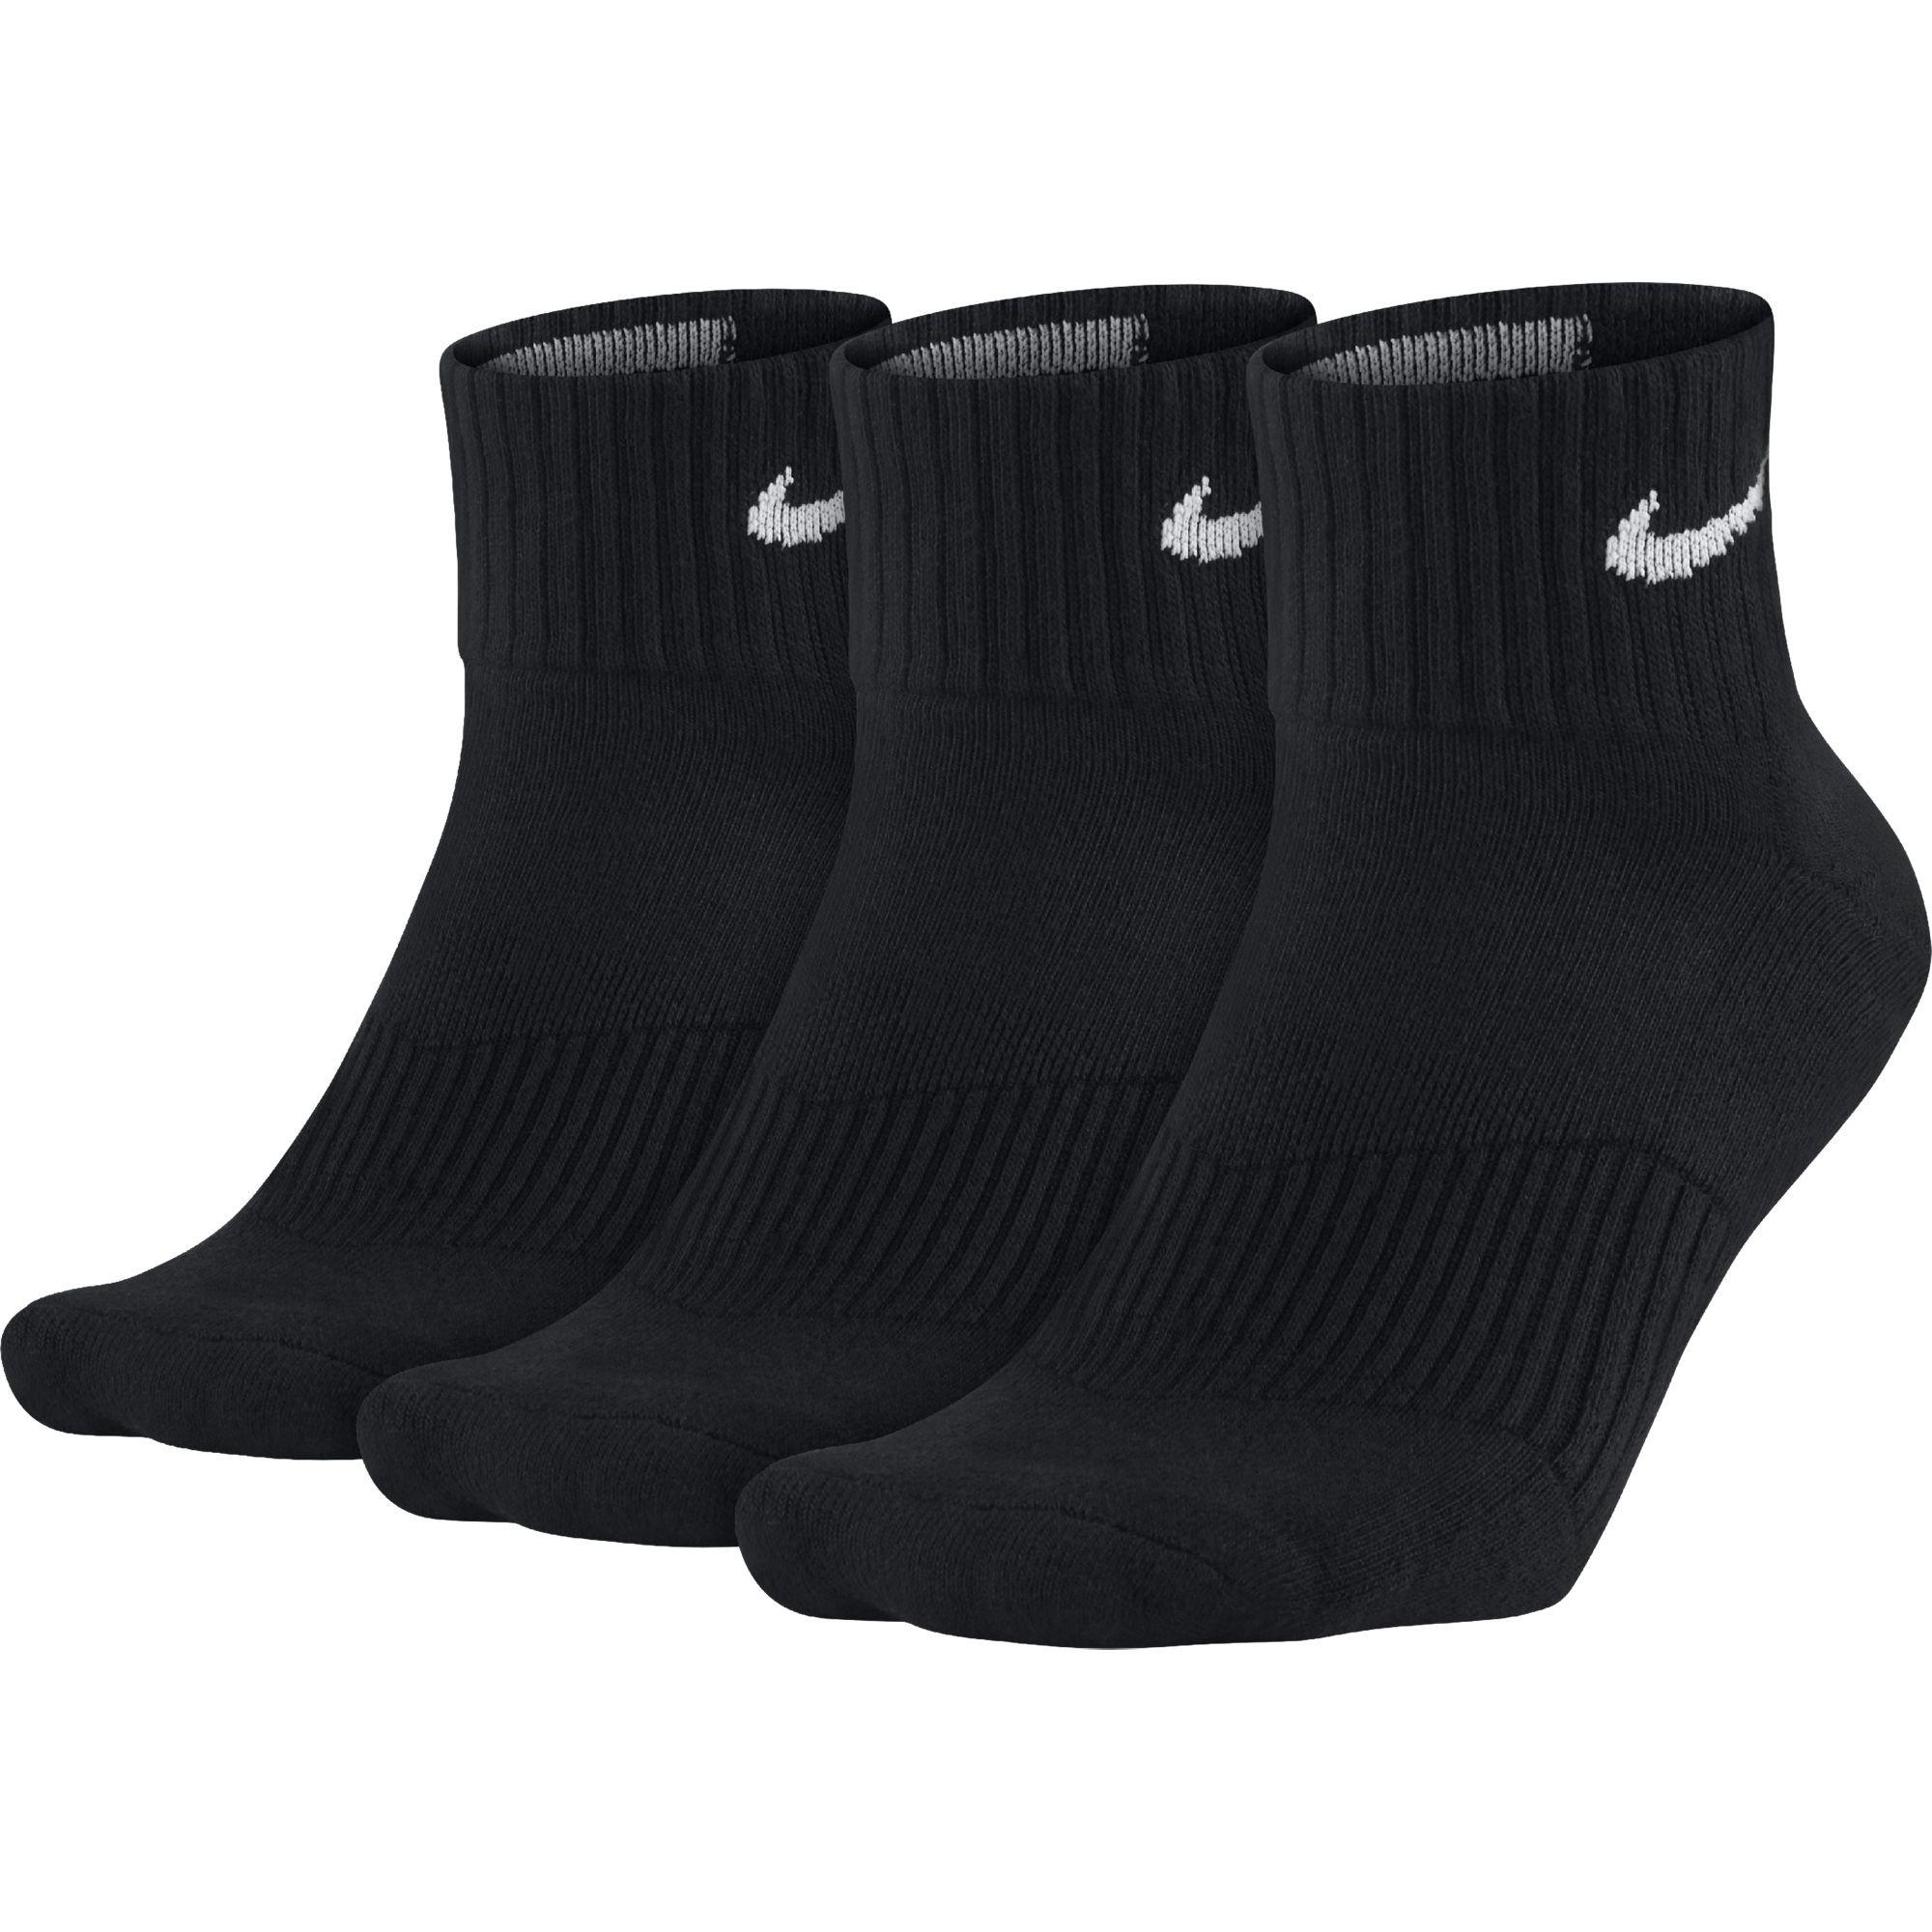 NIKE Unisex Performance Cushion Quarter Training Socks (3 Pairs), Black/White, Medium